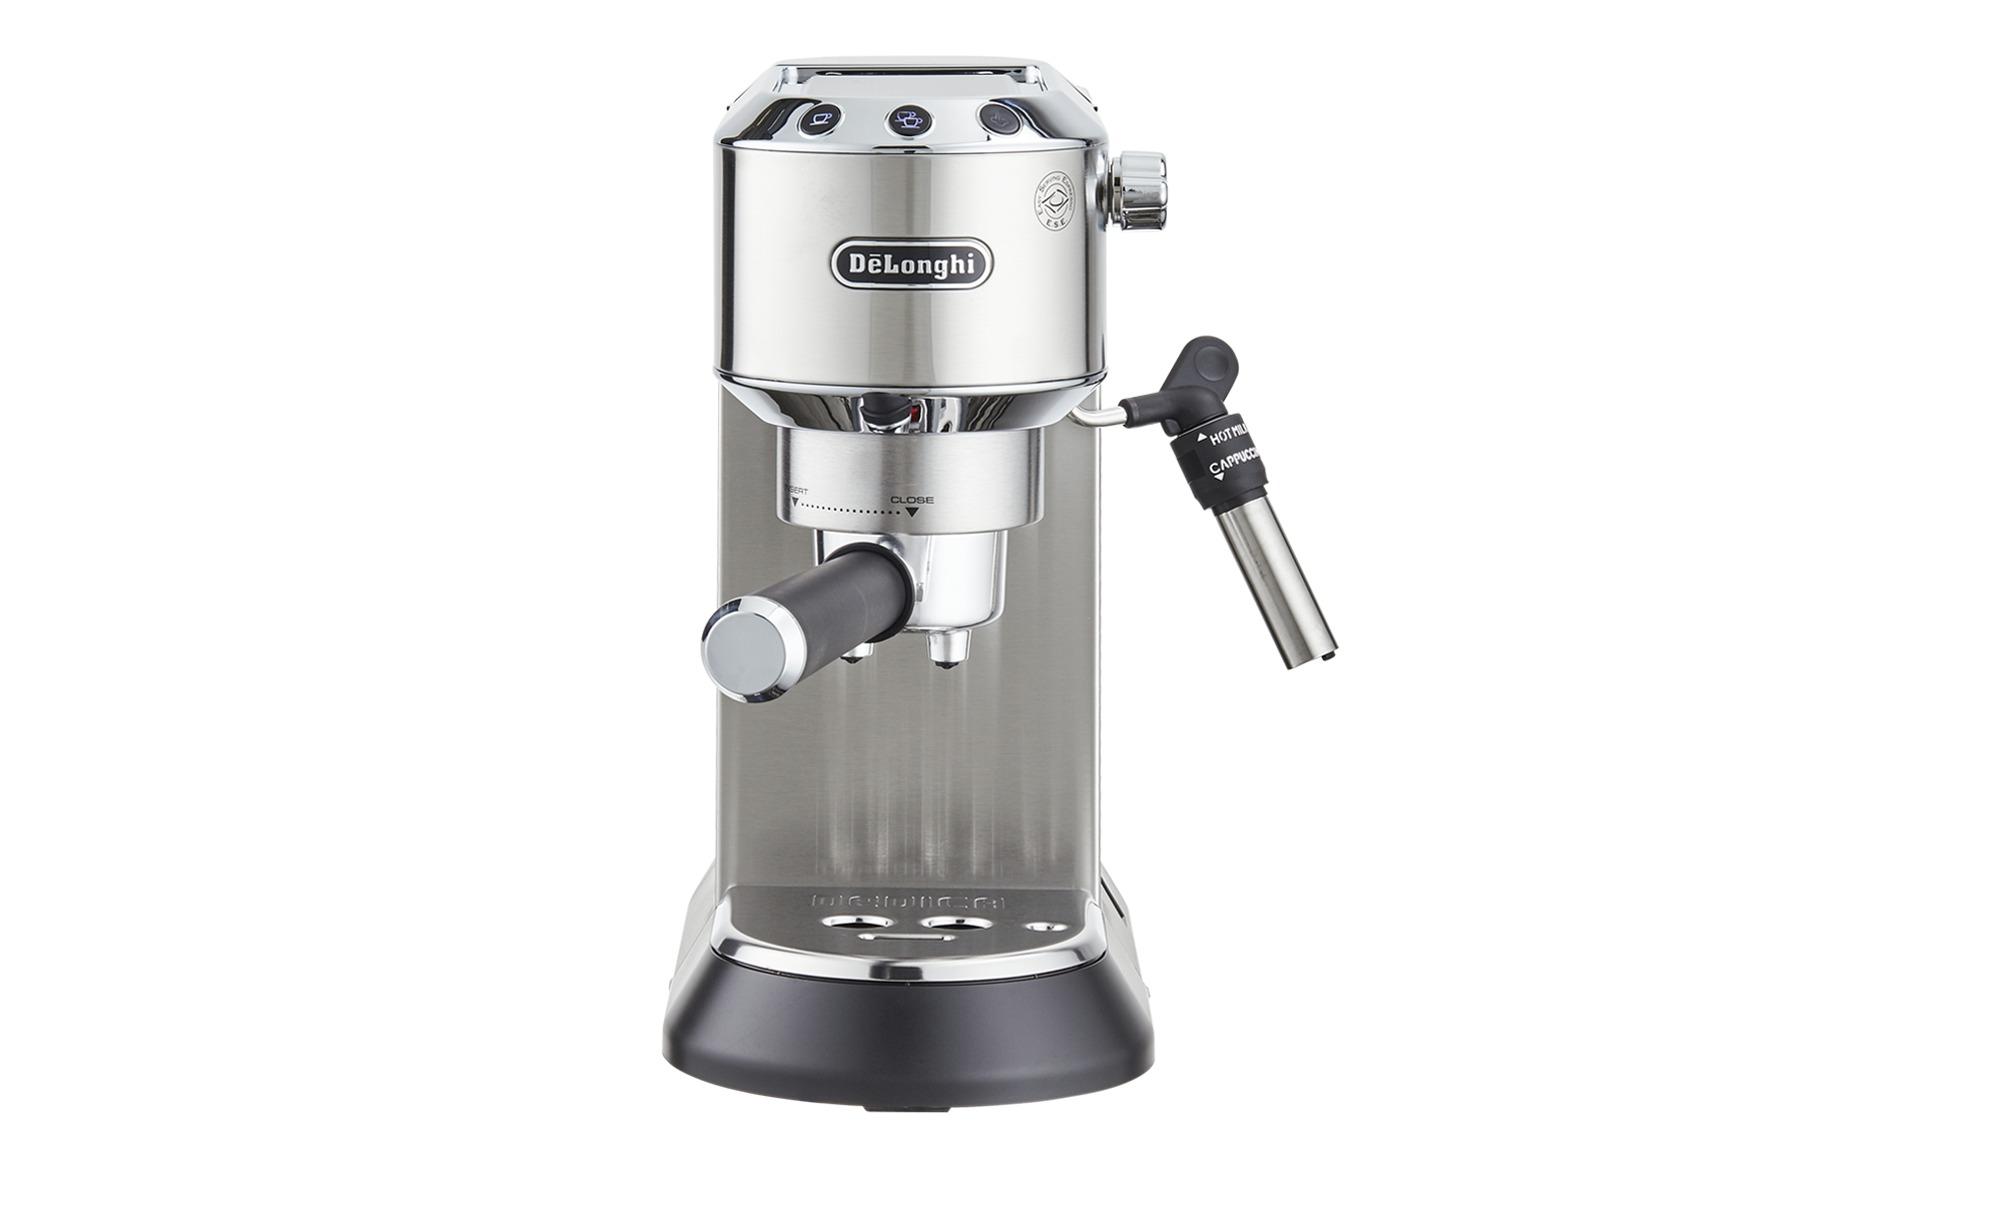 DeLonghi Espresso-Maschine  EC 685.M Dedica - silber - Kunststoff, Metall, Metall-lackiert - 14,9 cm - 30,5 cm - 33 cm - Elektrokleingeräte > Kaffee & Espressomaschinen - Möbel Kraft